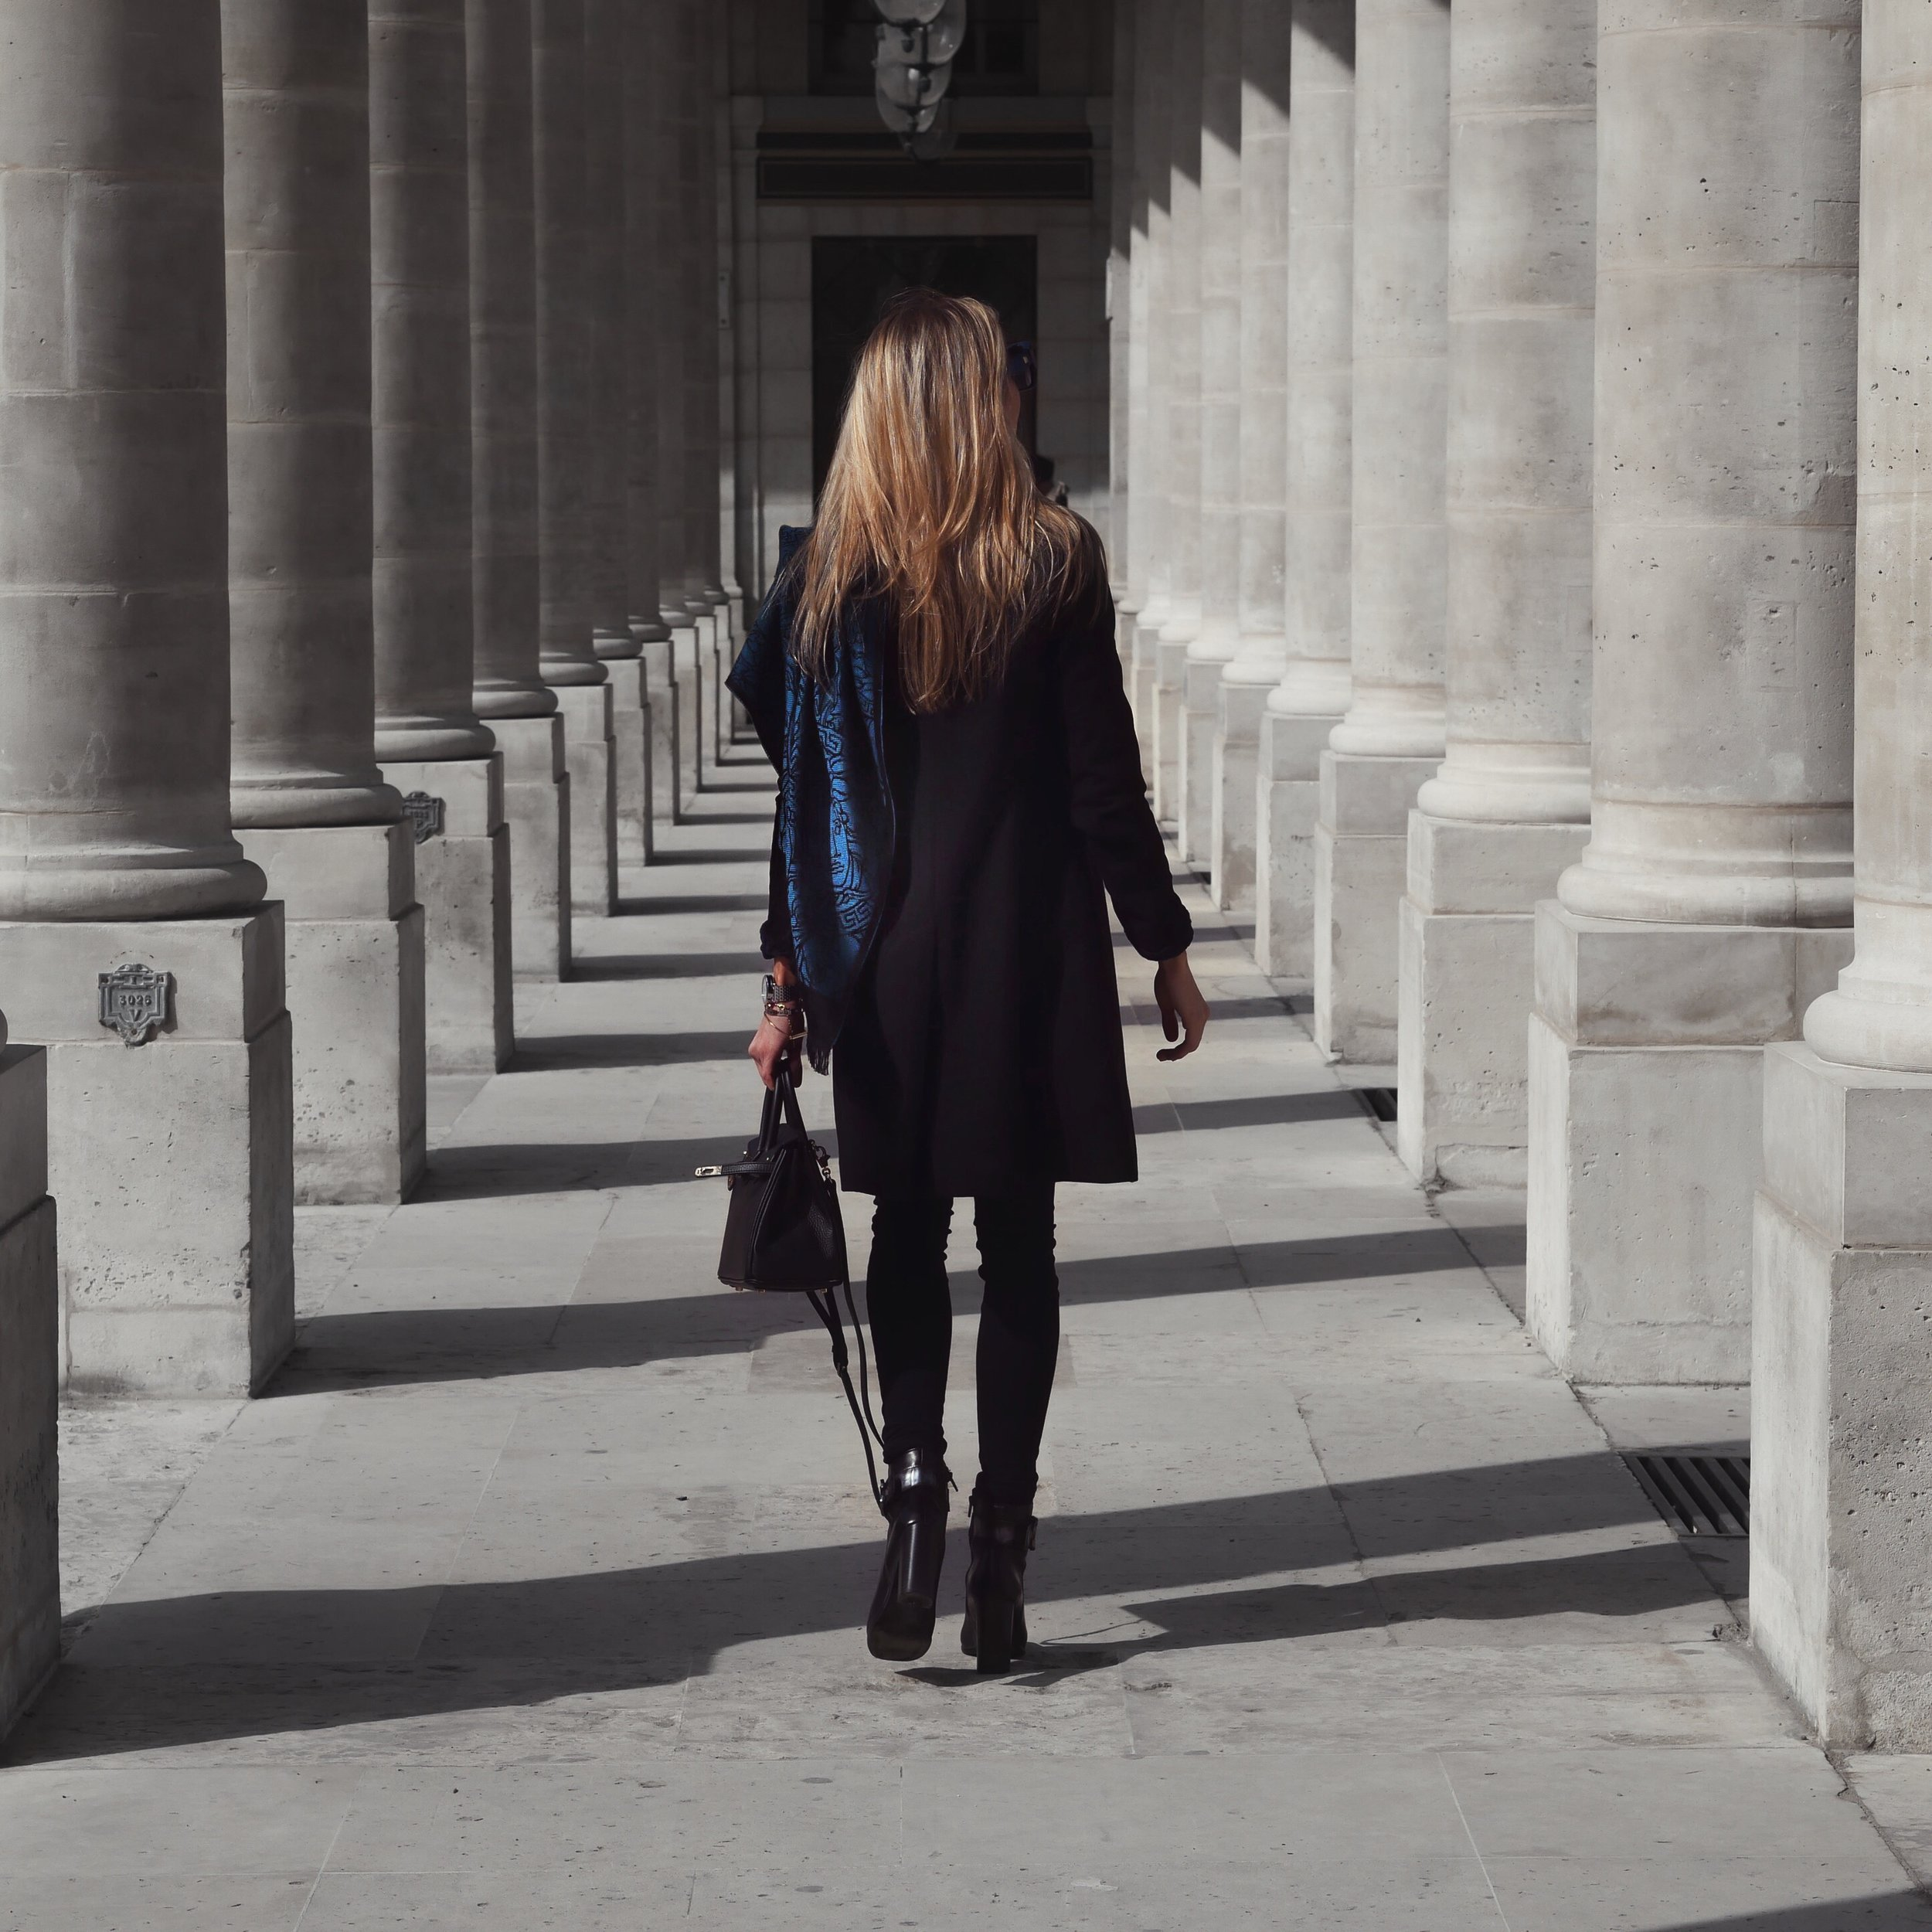 paris, travel, haul, affordable fashion, streetstyle, inspiration, what to wear, fashion, lookbook, style, fashion blogger, laura blair, youtuber, london fashion girl